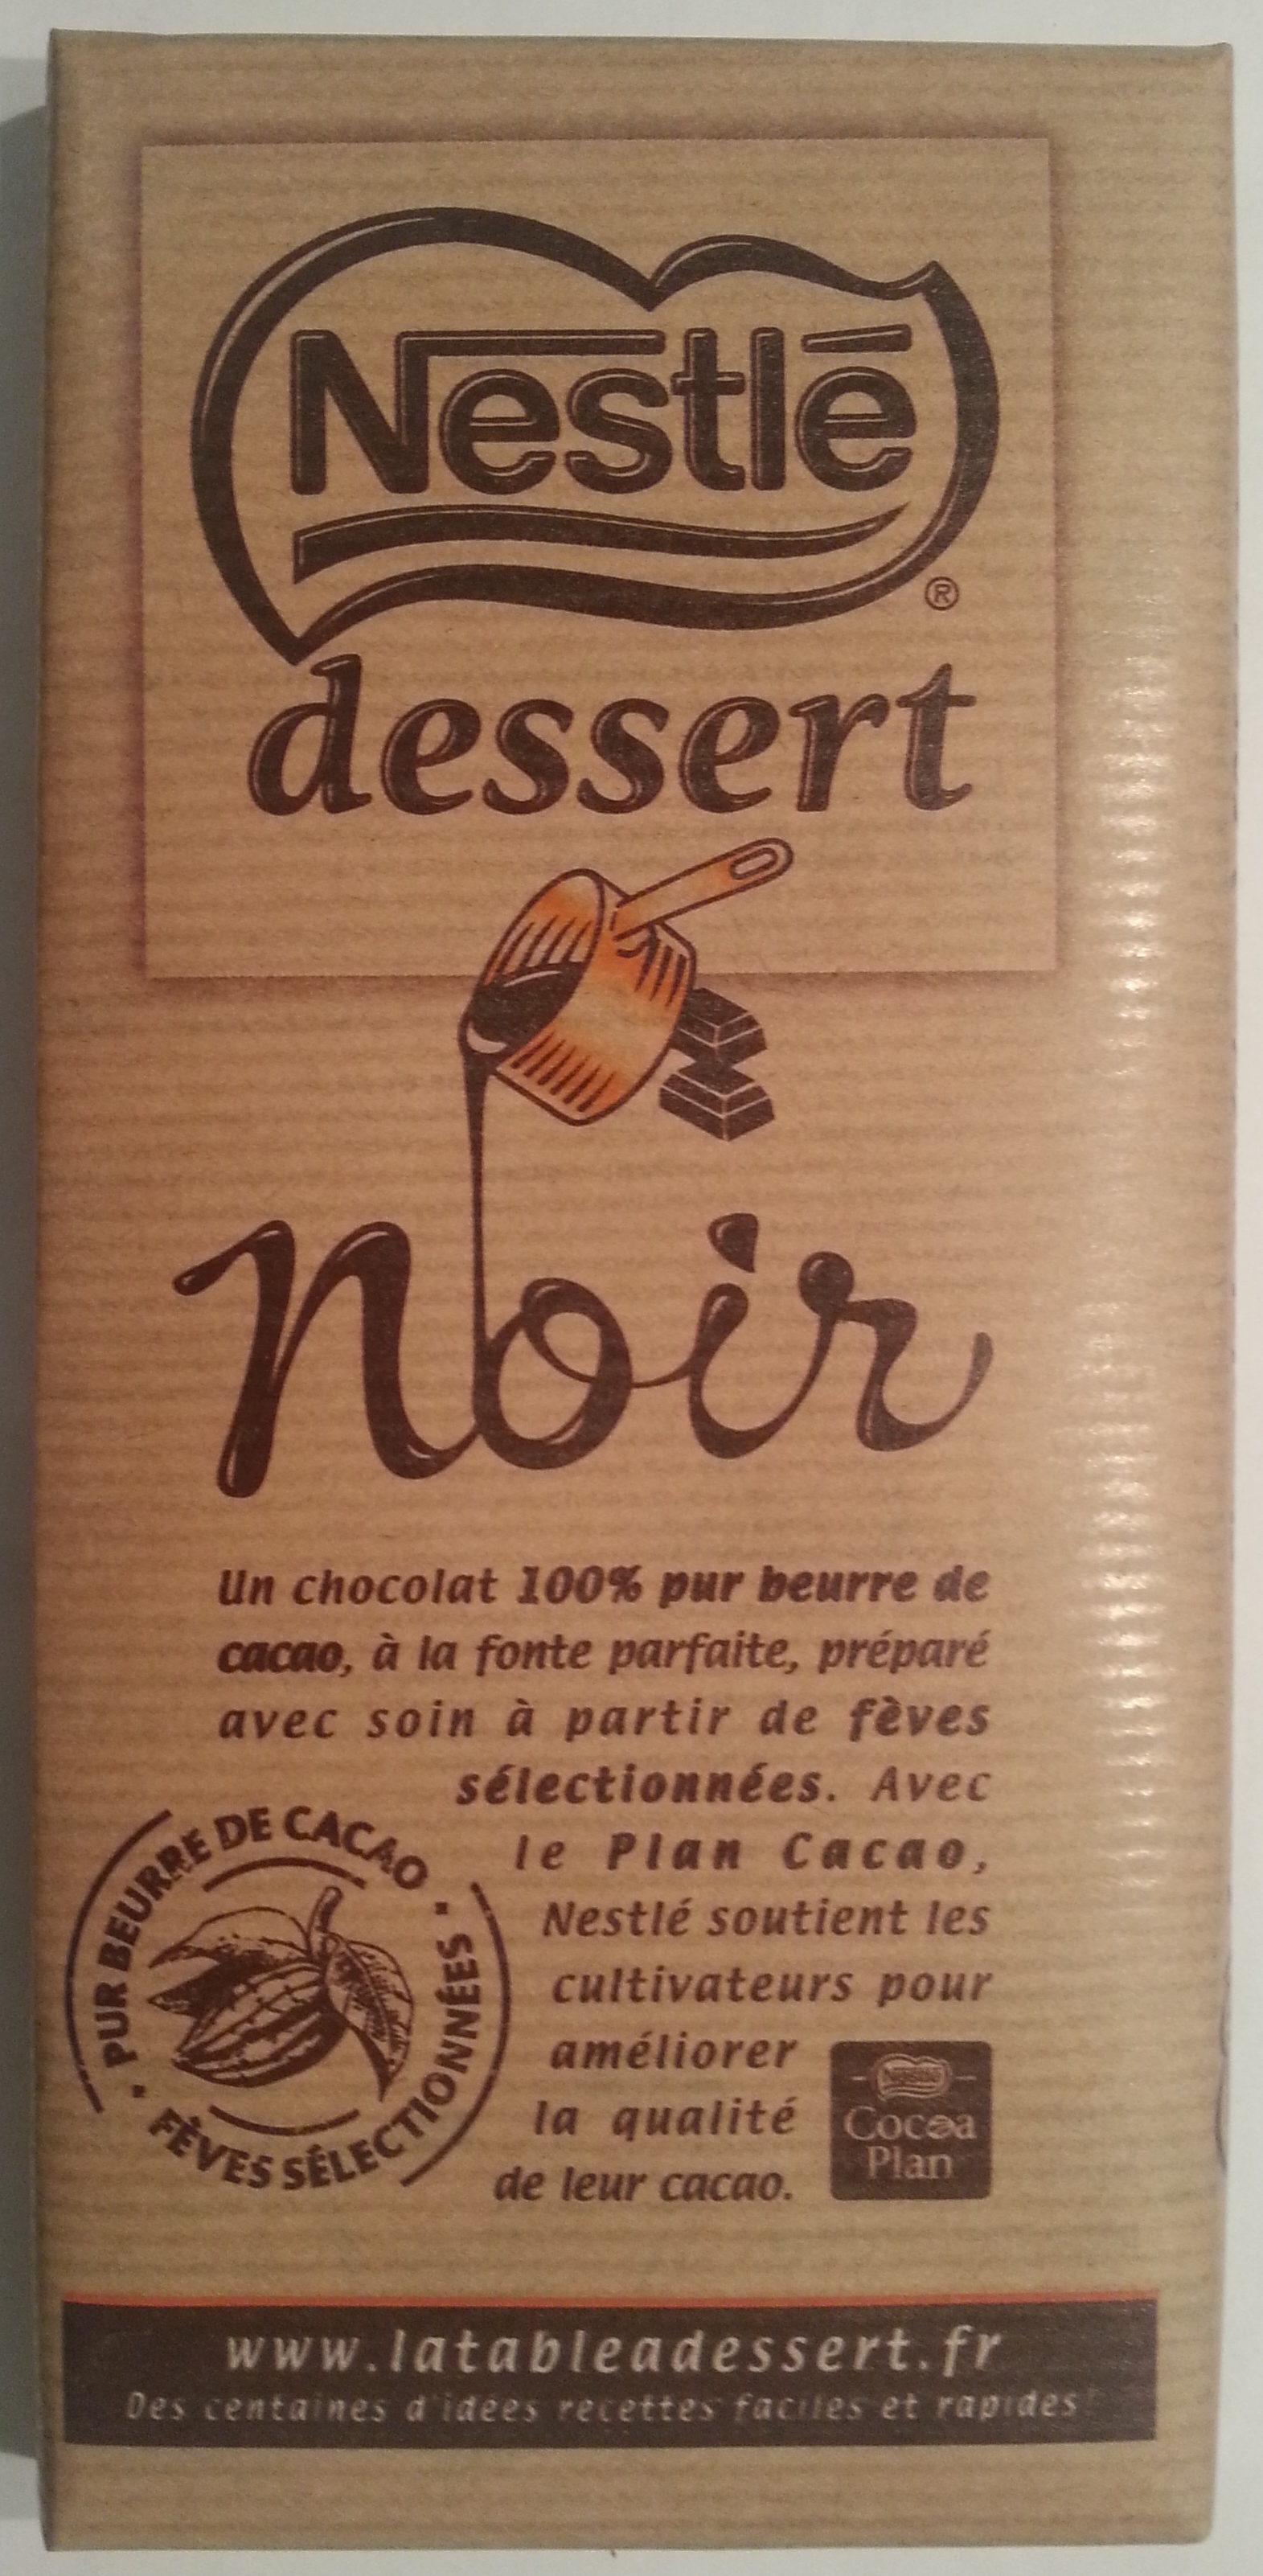 Chocolat noir dessert - Product